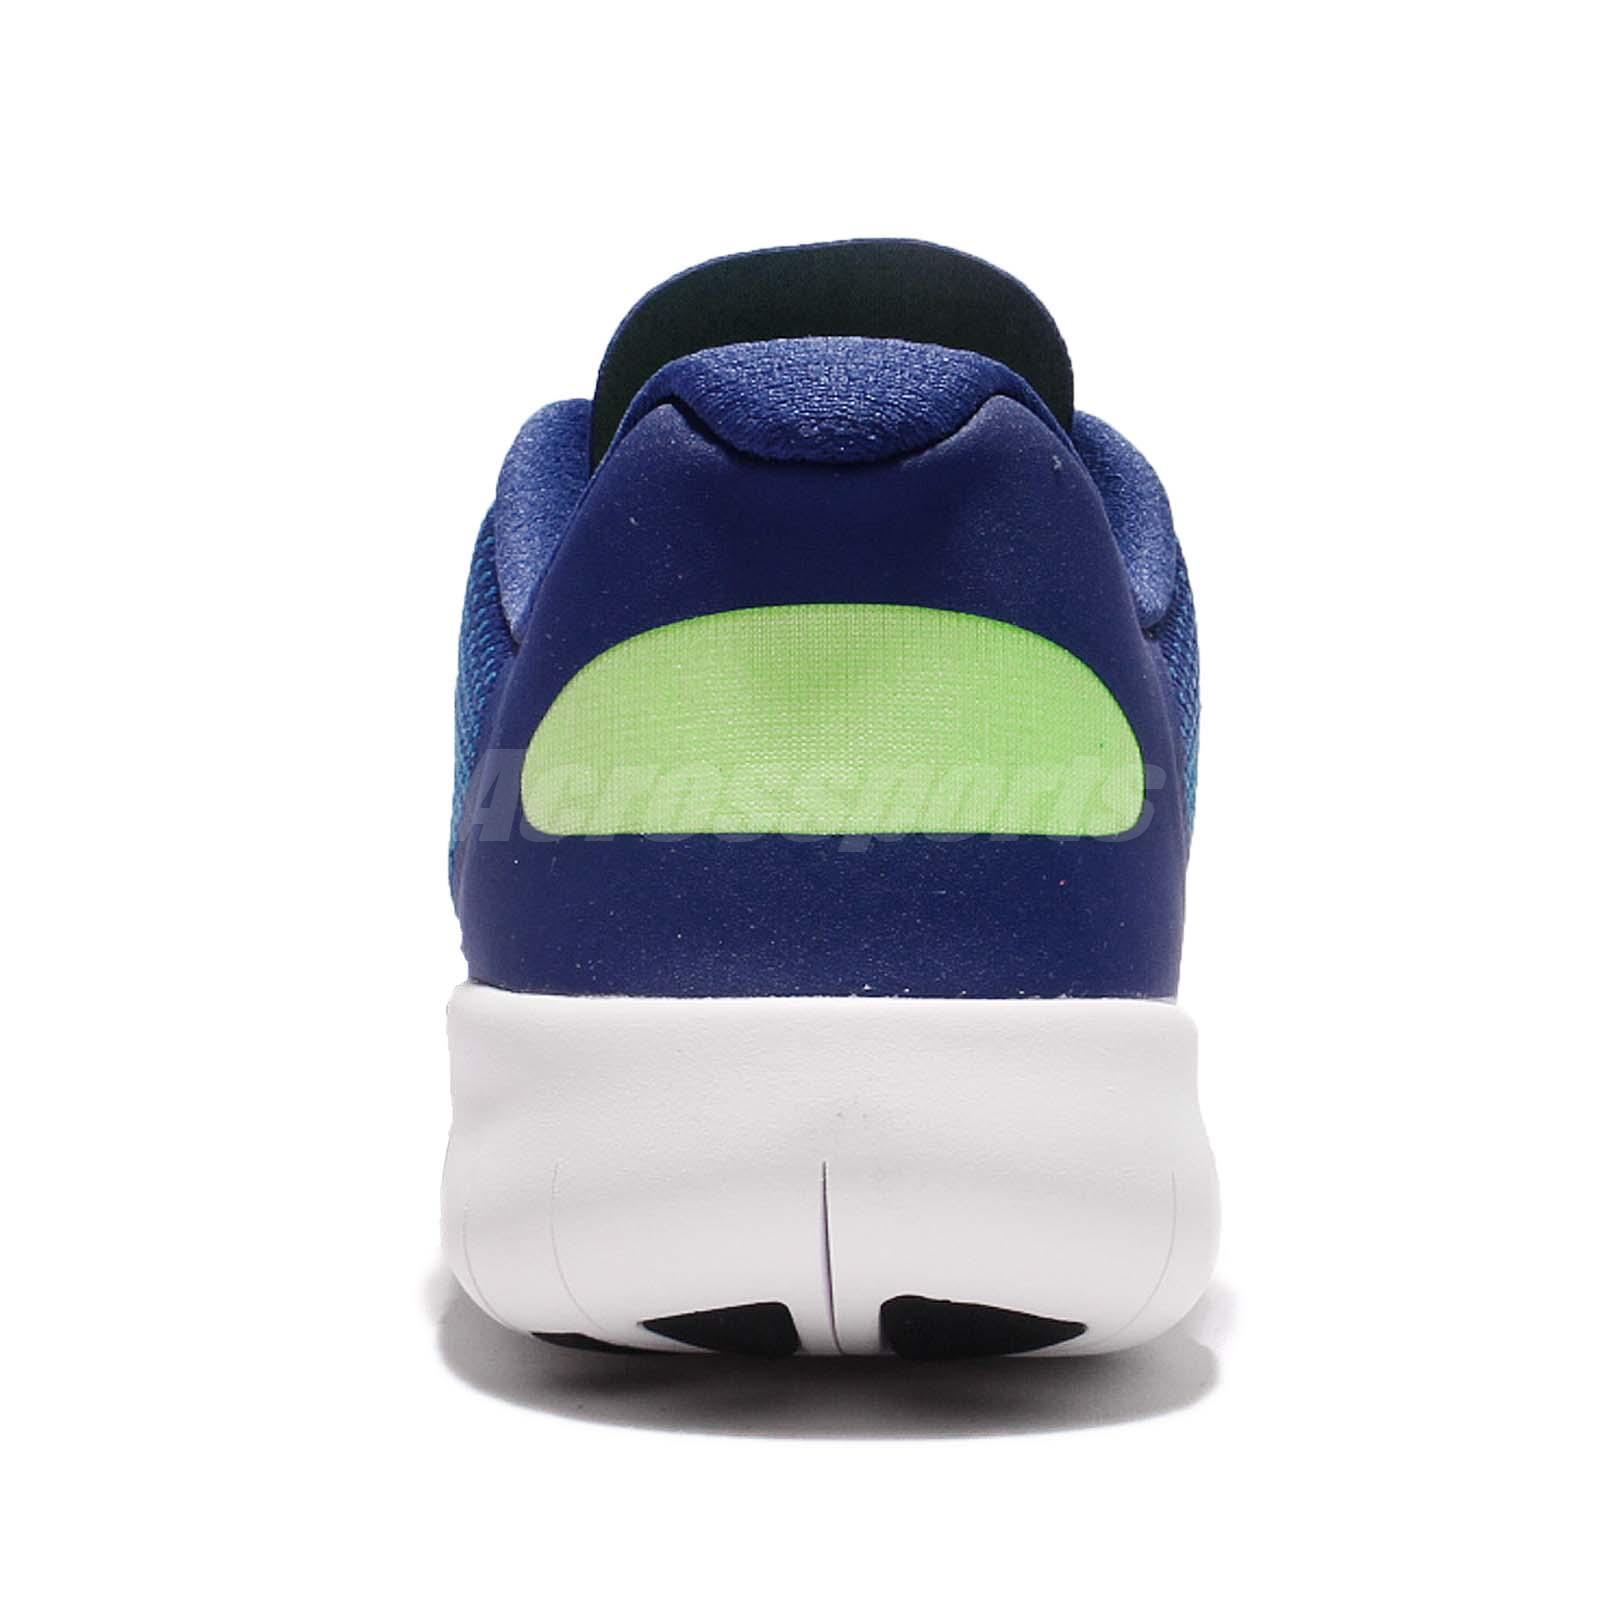 eecebe51e9b Nike Free RN 2017 GS Run Blue White Kids Running Shoes Sneakers ...